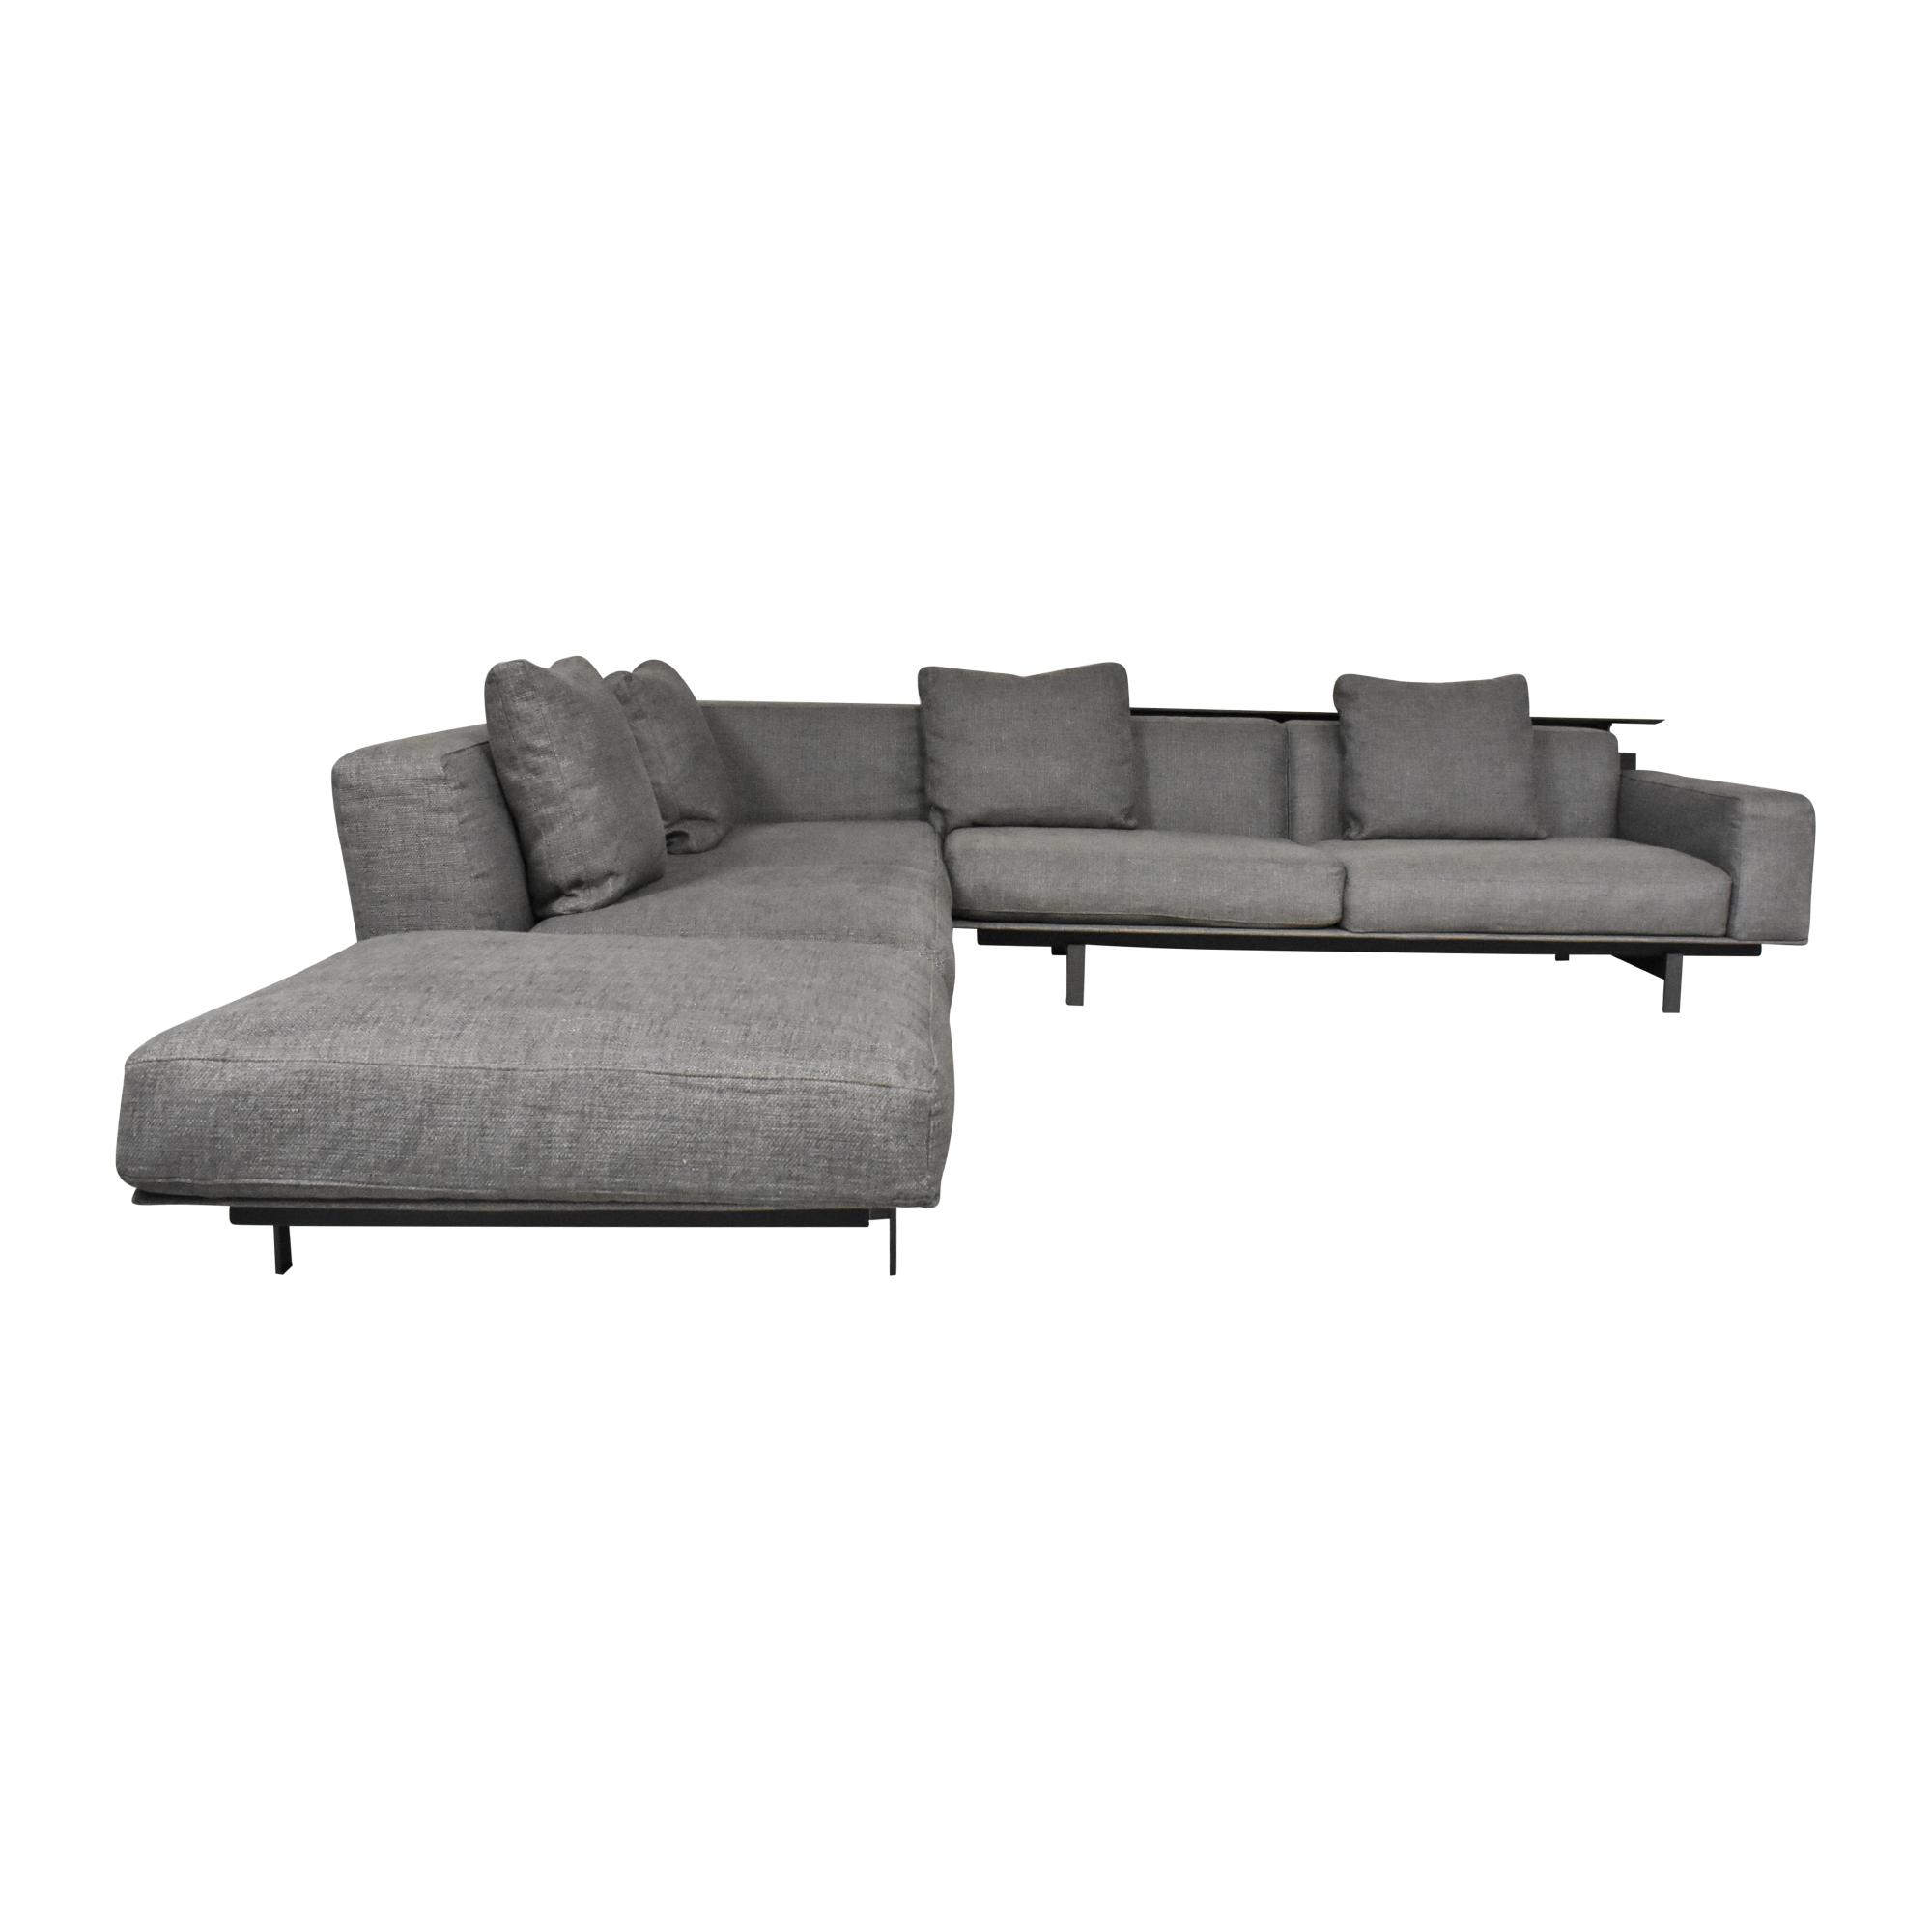 LEMA LEMA Yard Modular Sectional Sofa used